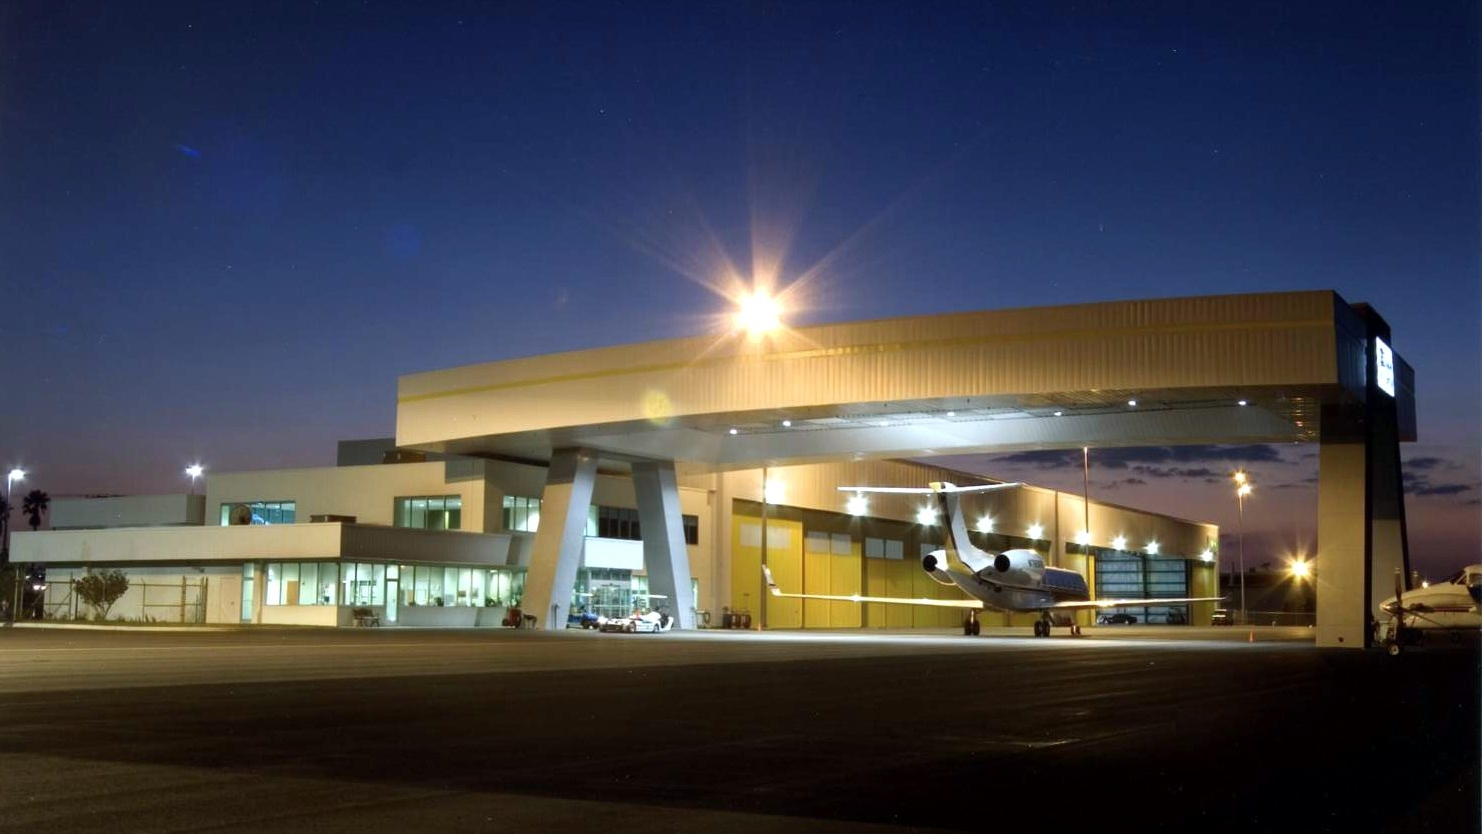 Rotation of Tampa International Jet Center night 5-17-05.jpg